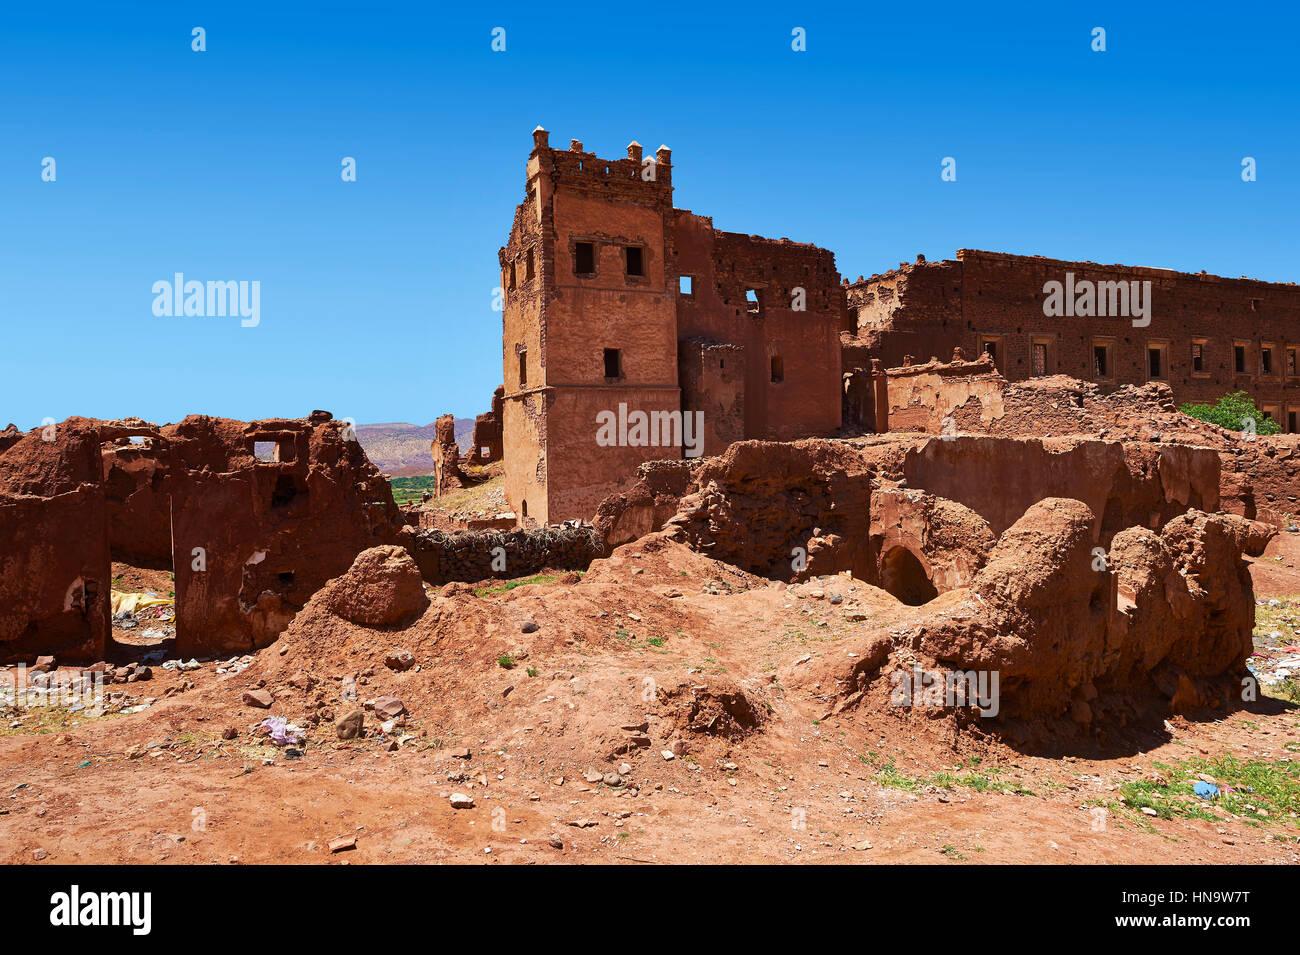 Exterior of the mud brick Berber Kasbah Telouet, Atlas Mountains Morocco - Stock Image